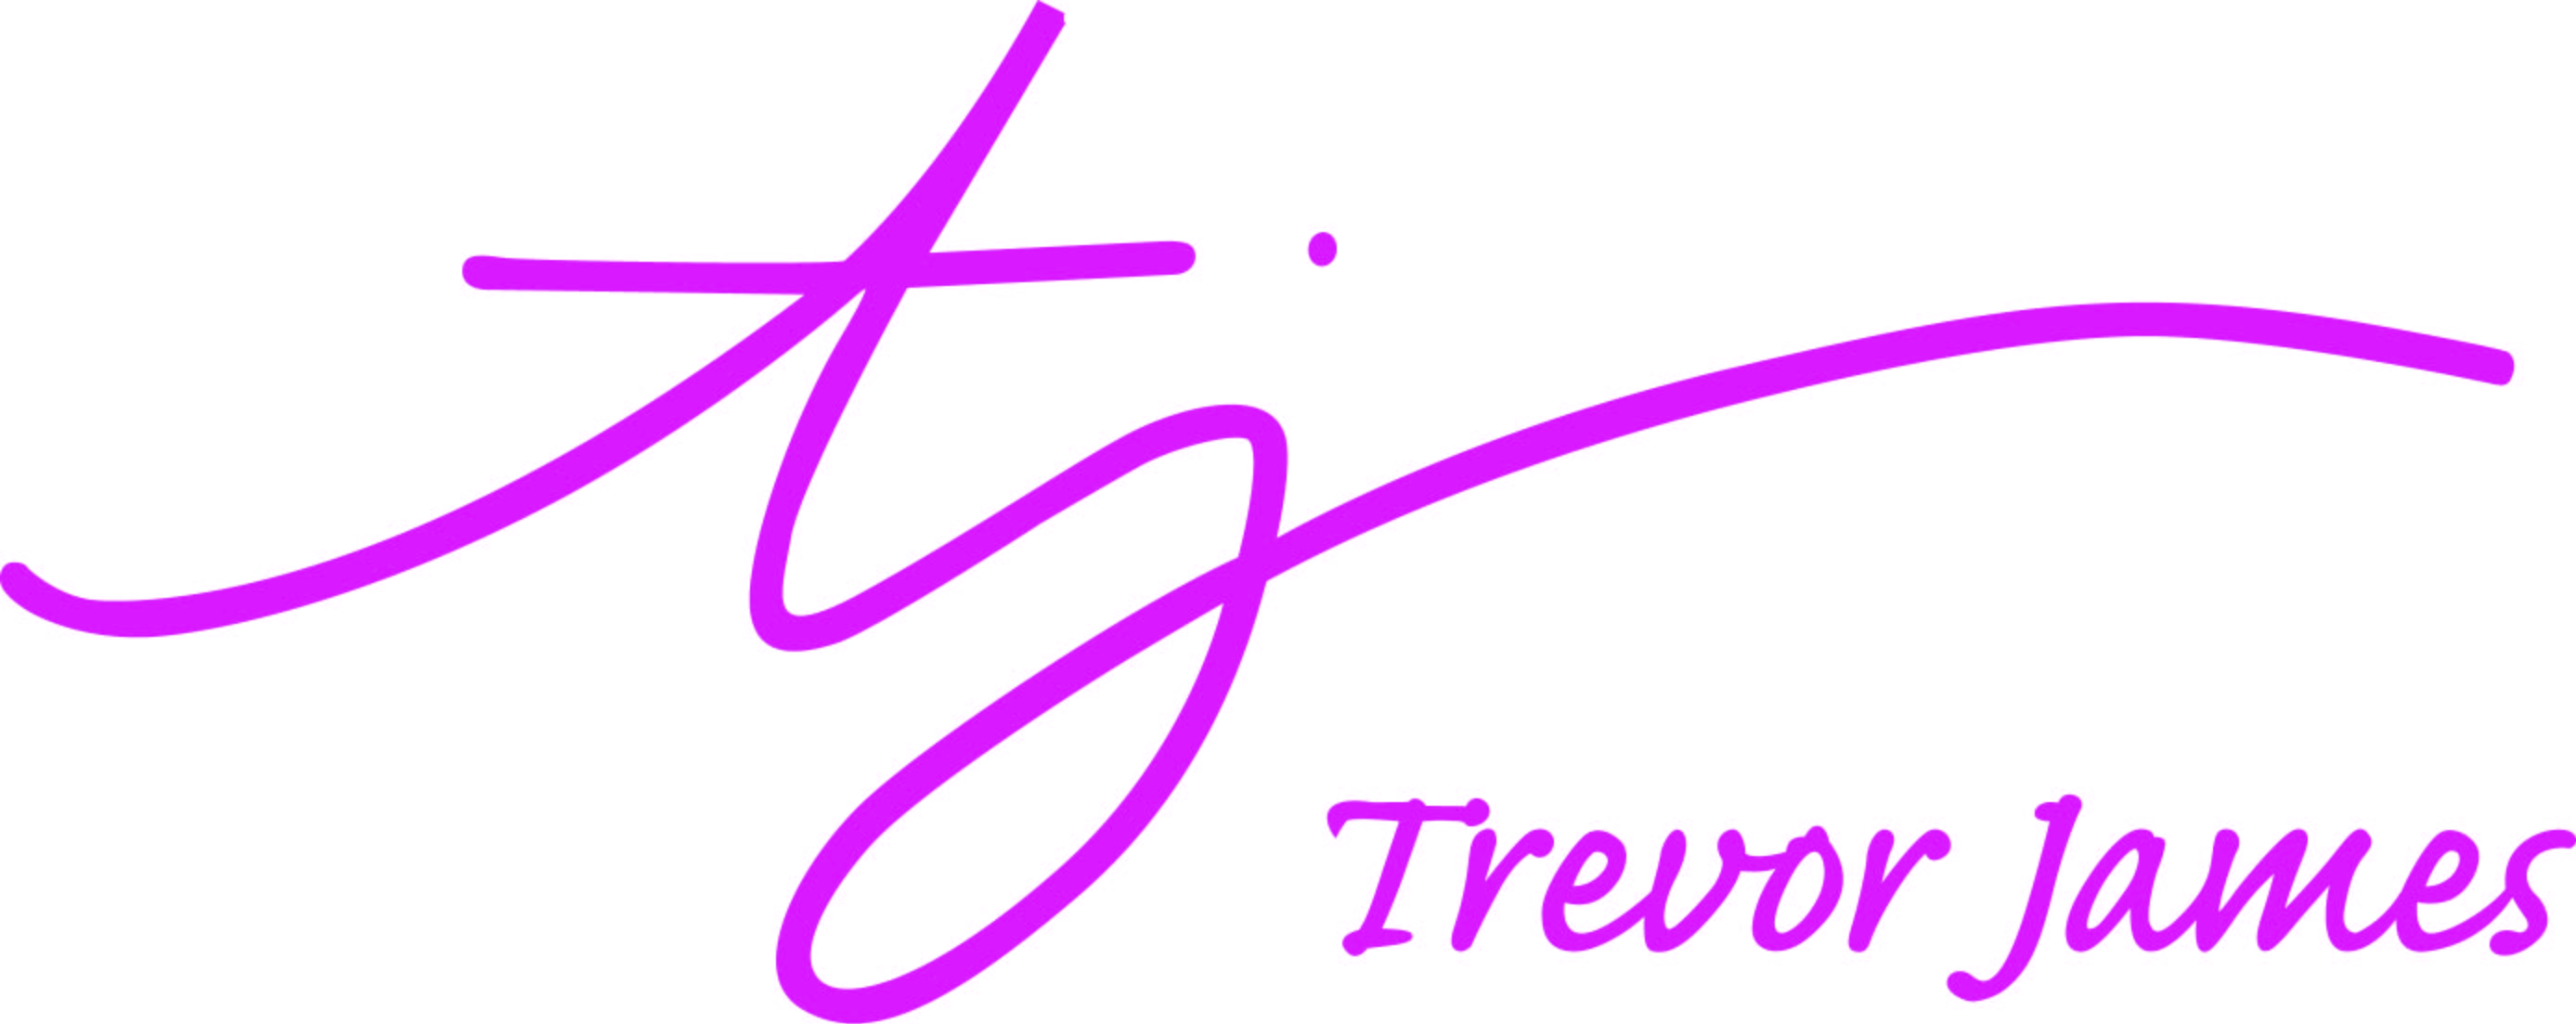 Trevor James - Performer 33223 - CD - 2. Kopfstück gebogen - Holzblasinstrumente - Alt-Flöten   MUSIK BERTRAM Deutschland Freiburg